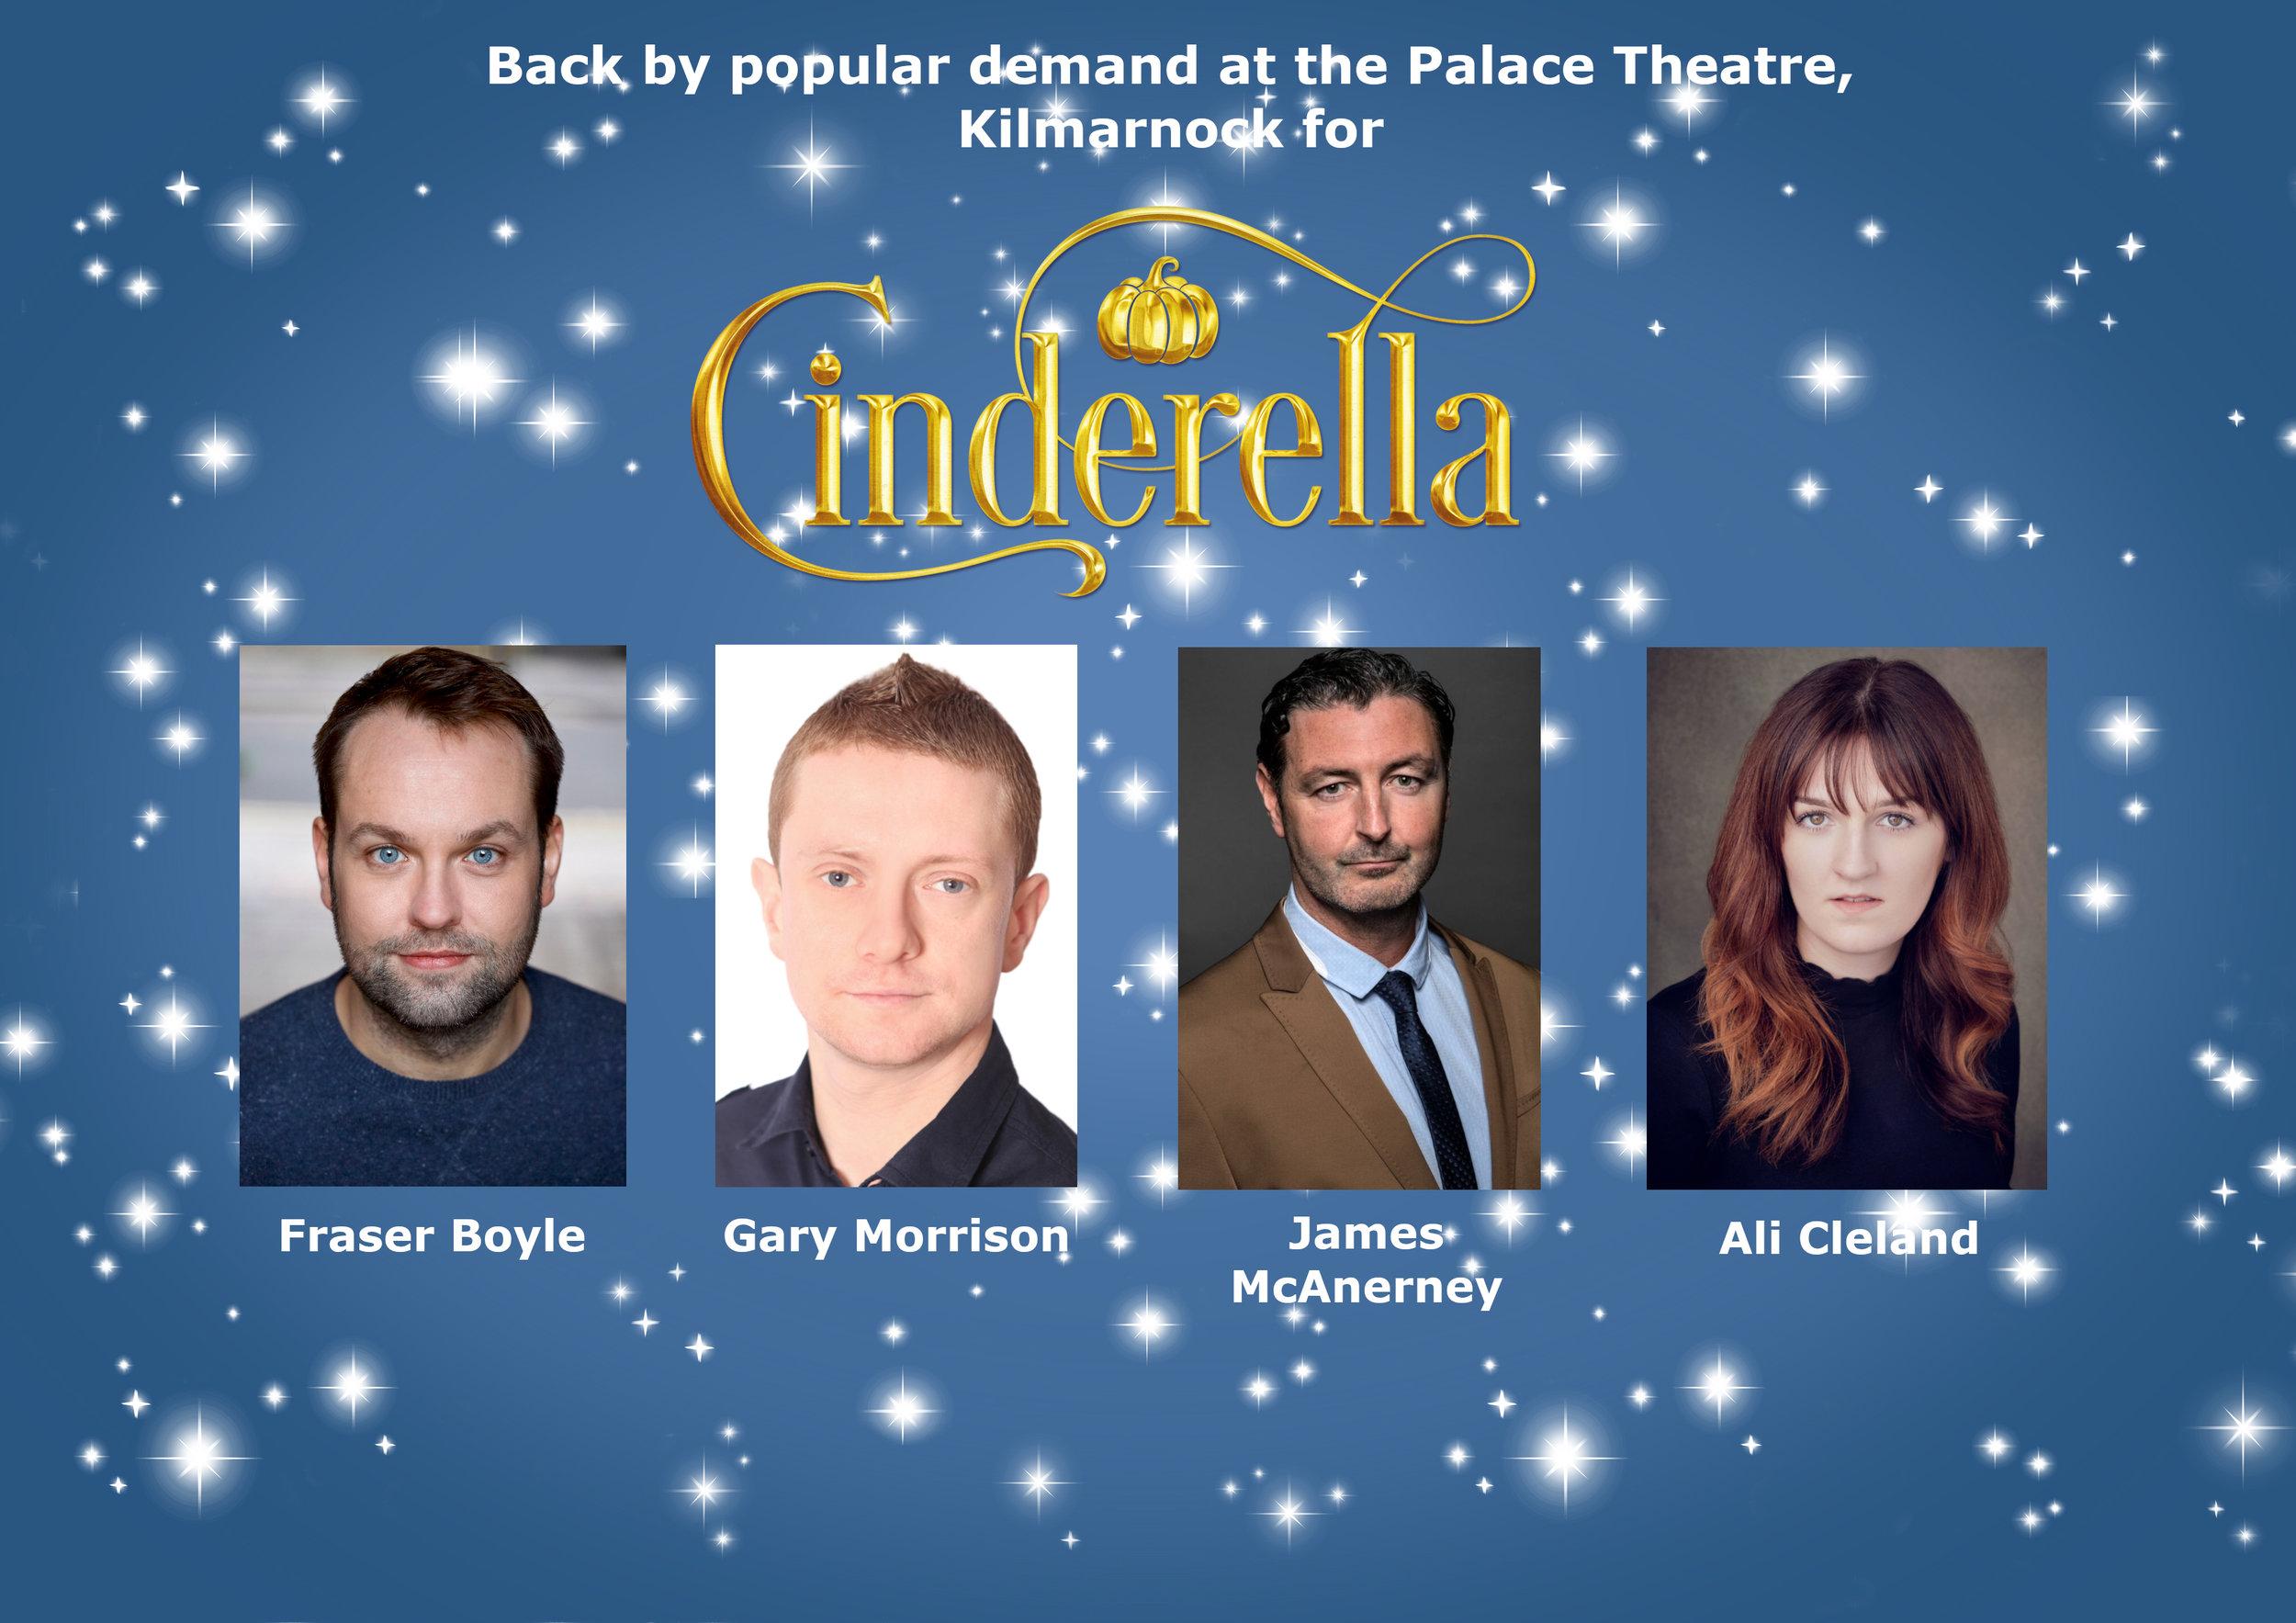 Palace Theatre Panto Stars Return for a Magical Cinderella — Imagine